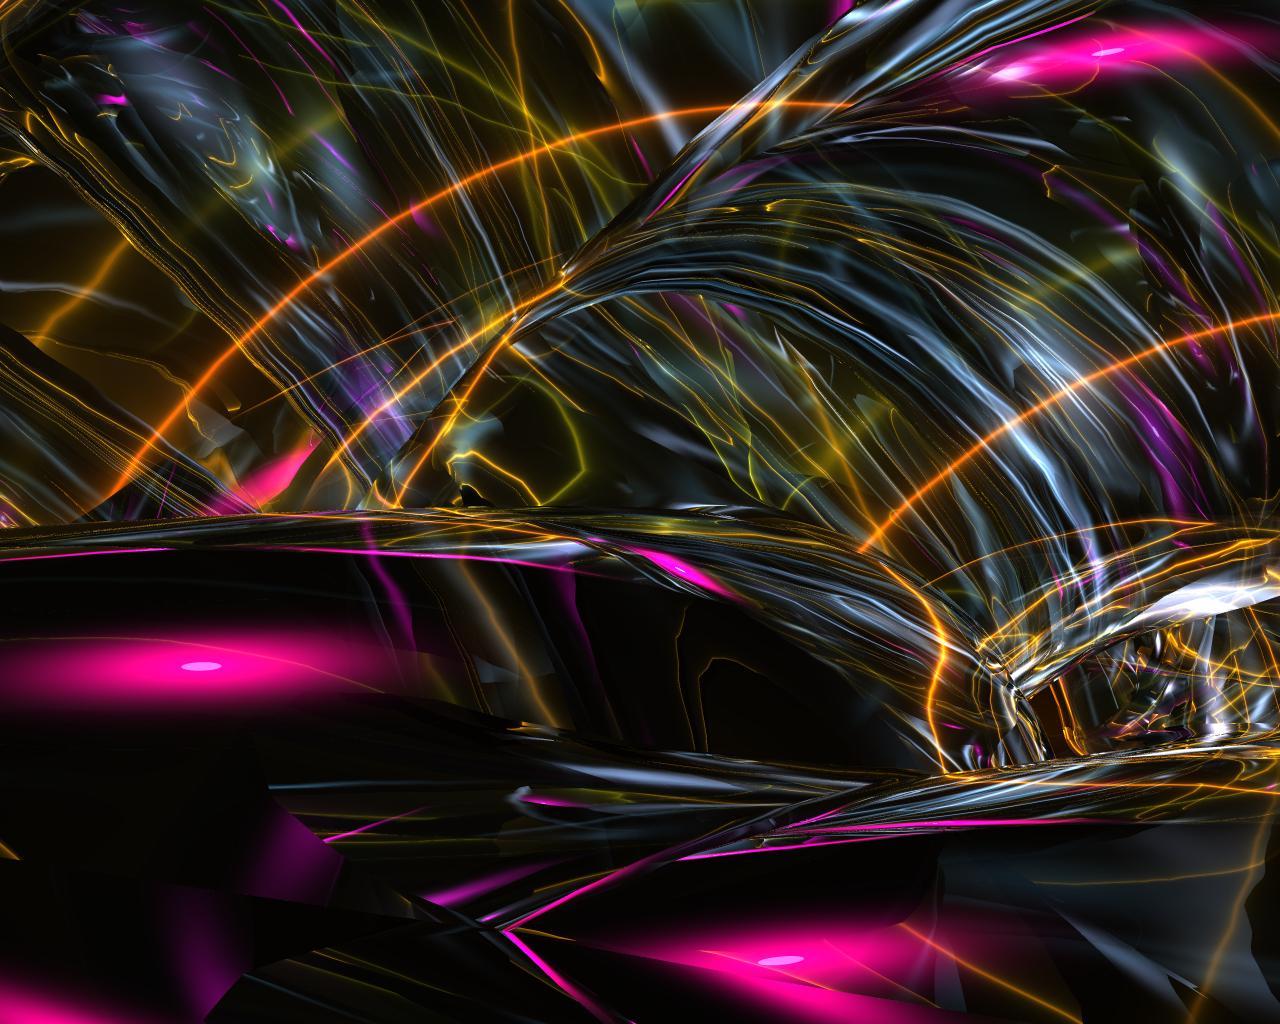 http://3.bp.blogspot.com/-BM1m17fswCo/ToGKUMovXnI/AAAAAAAAA_U/GdCZXXwoq2s/s1600/Neon%252520Nights%2525201280X1024%252520Wallpaper-700108.jpg